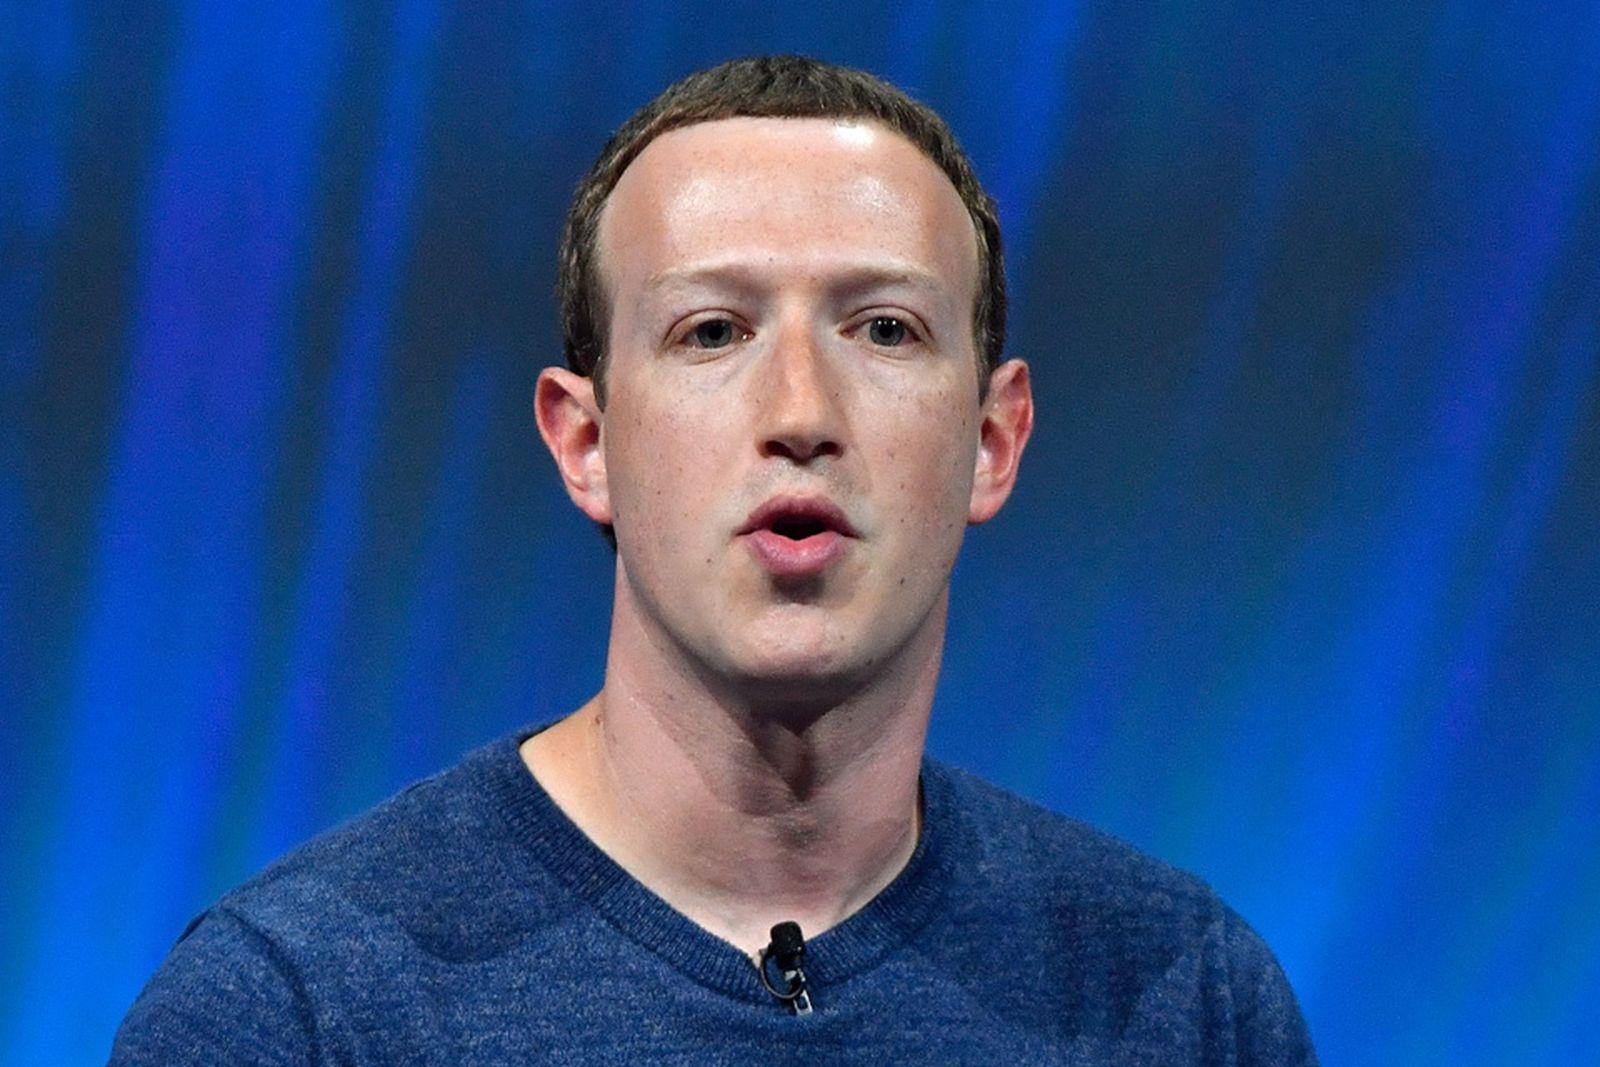 facebook apology public posts mark zuckerberg